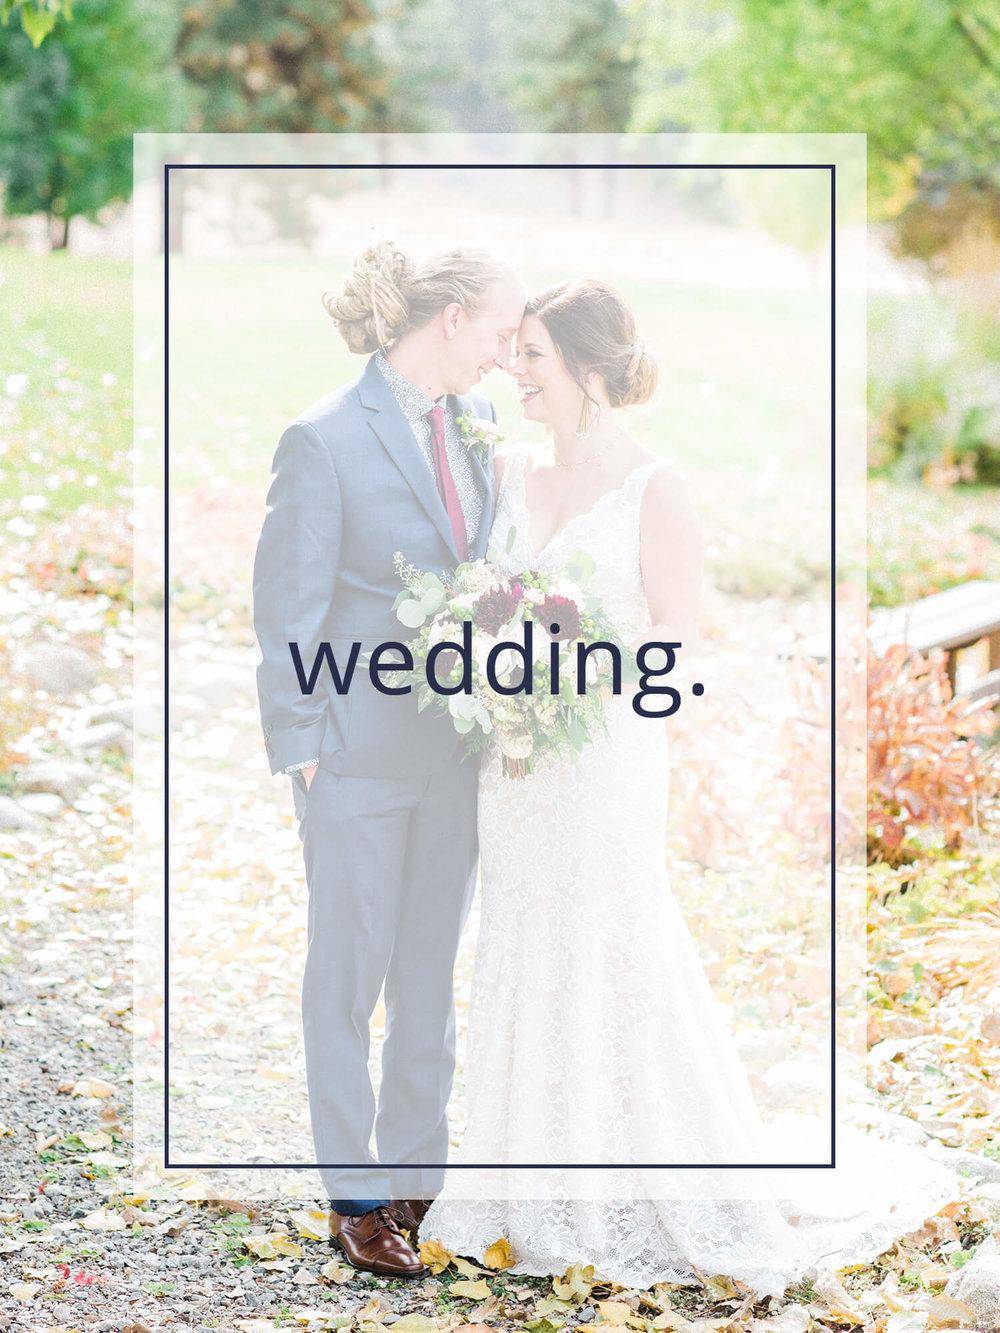 KC England Photography - Home Photo Buttons_Wedding.jpg